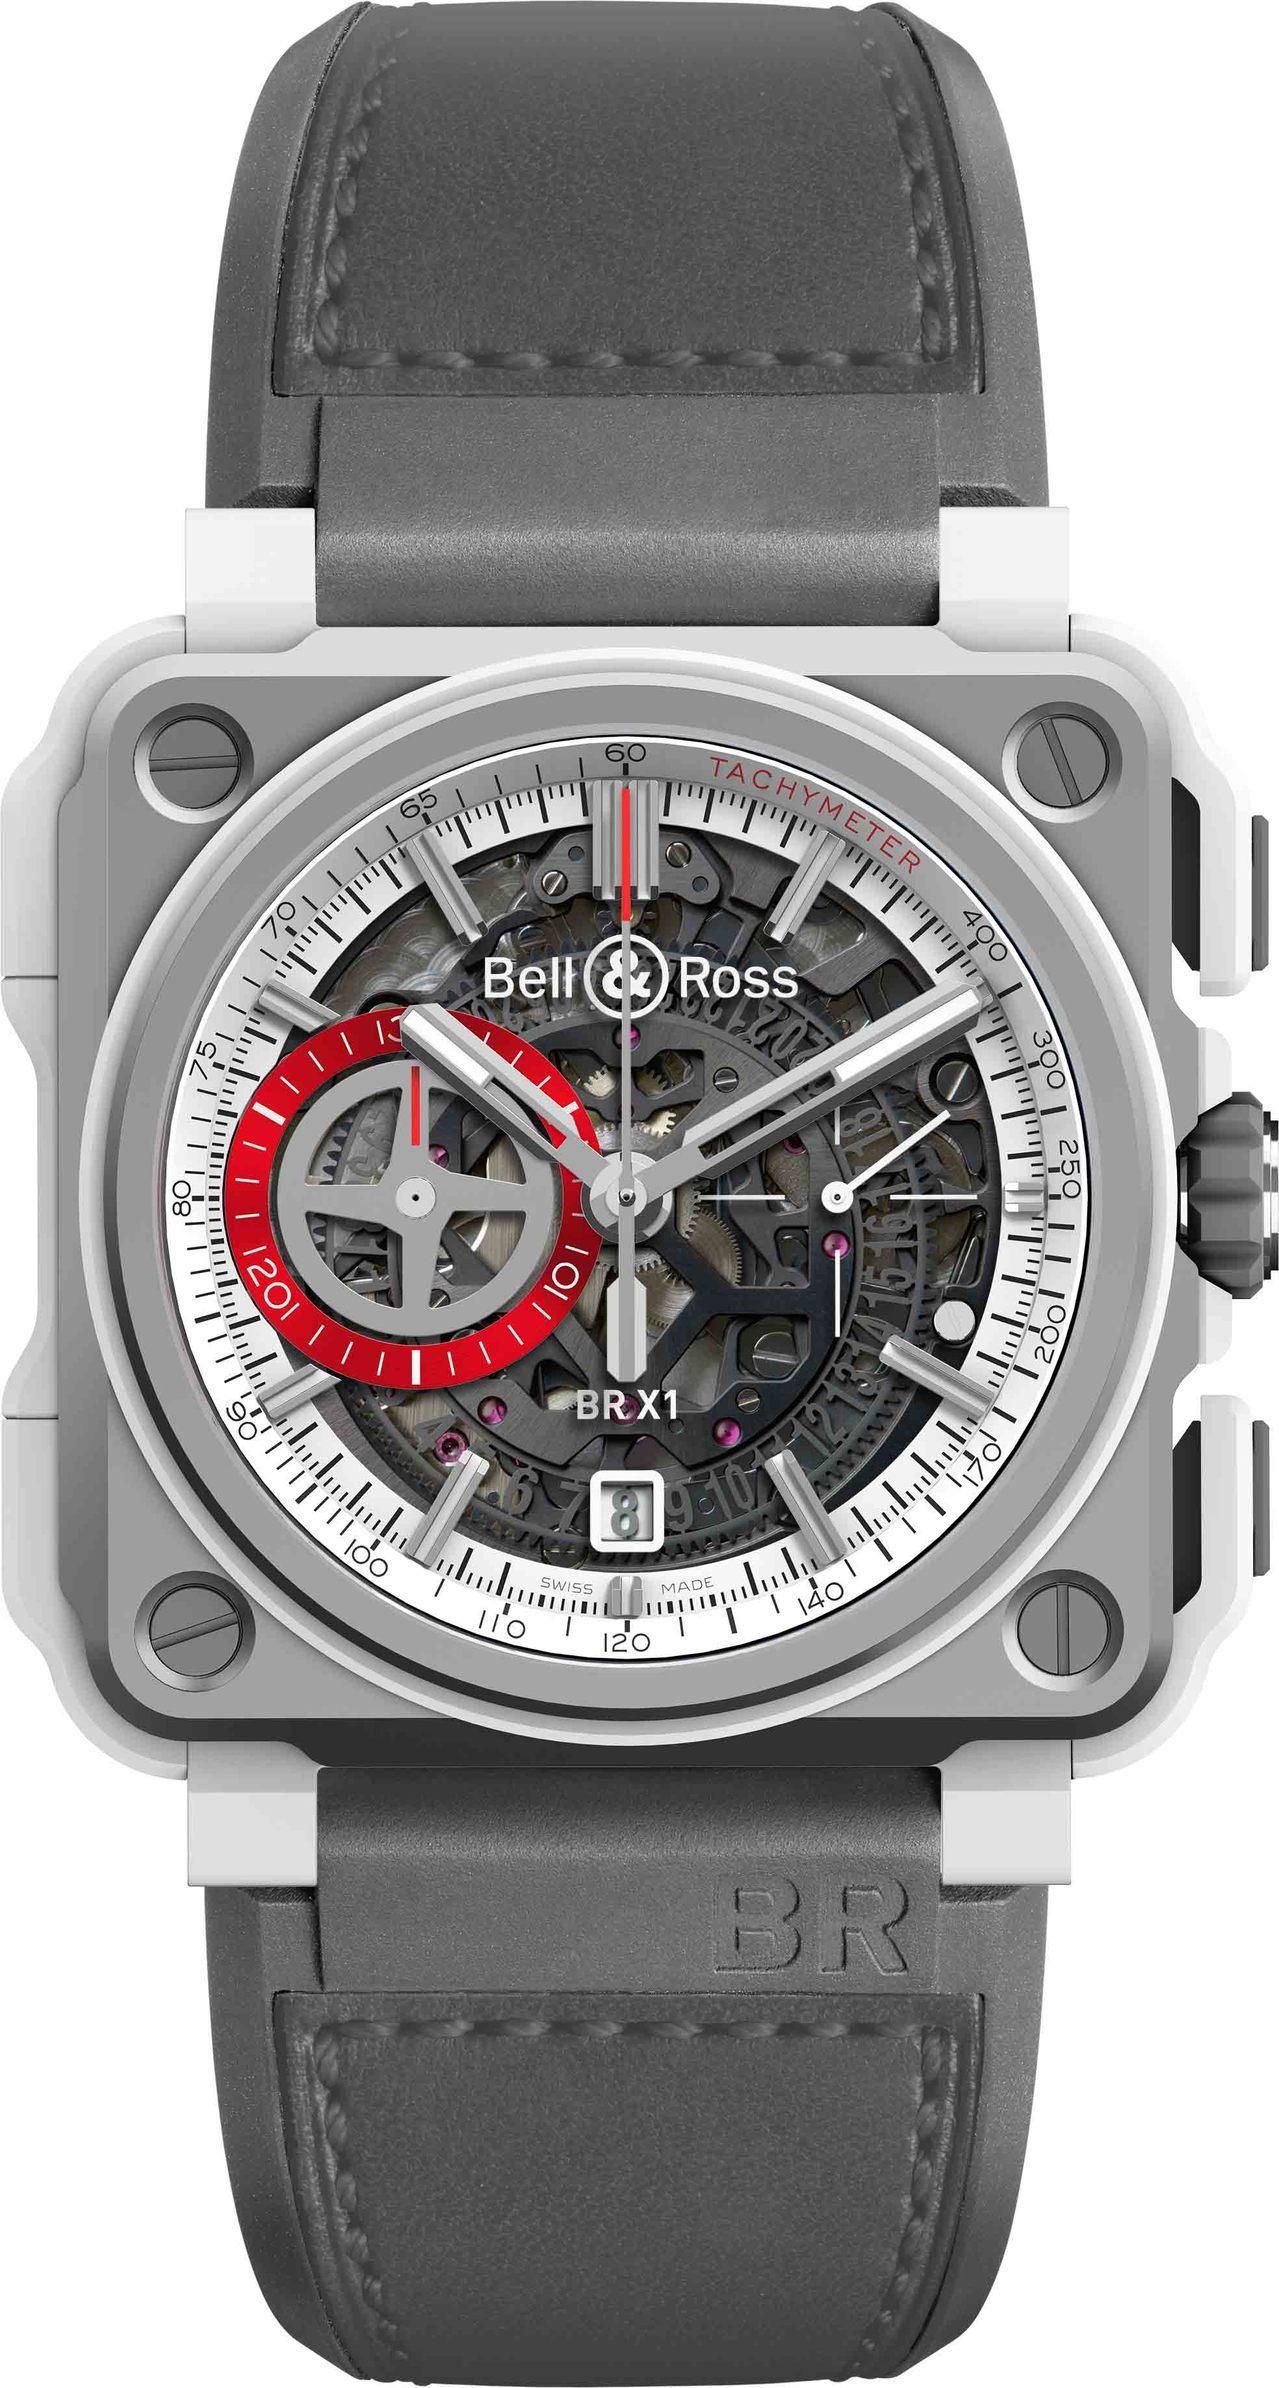 BR-X1 White Hawk鏤空計時碼表,限量250只,約66萬7,200元...